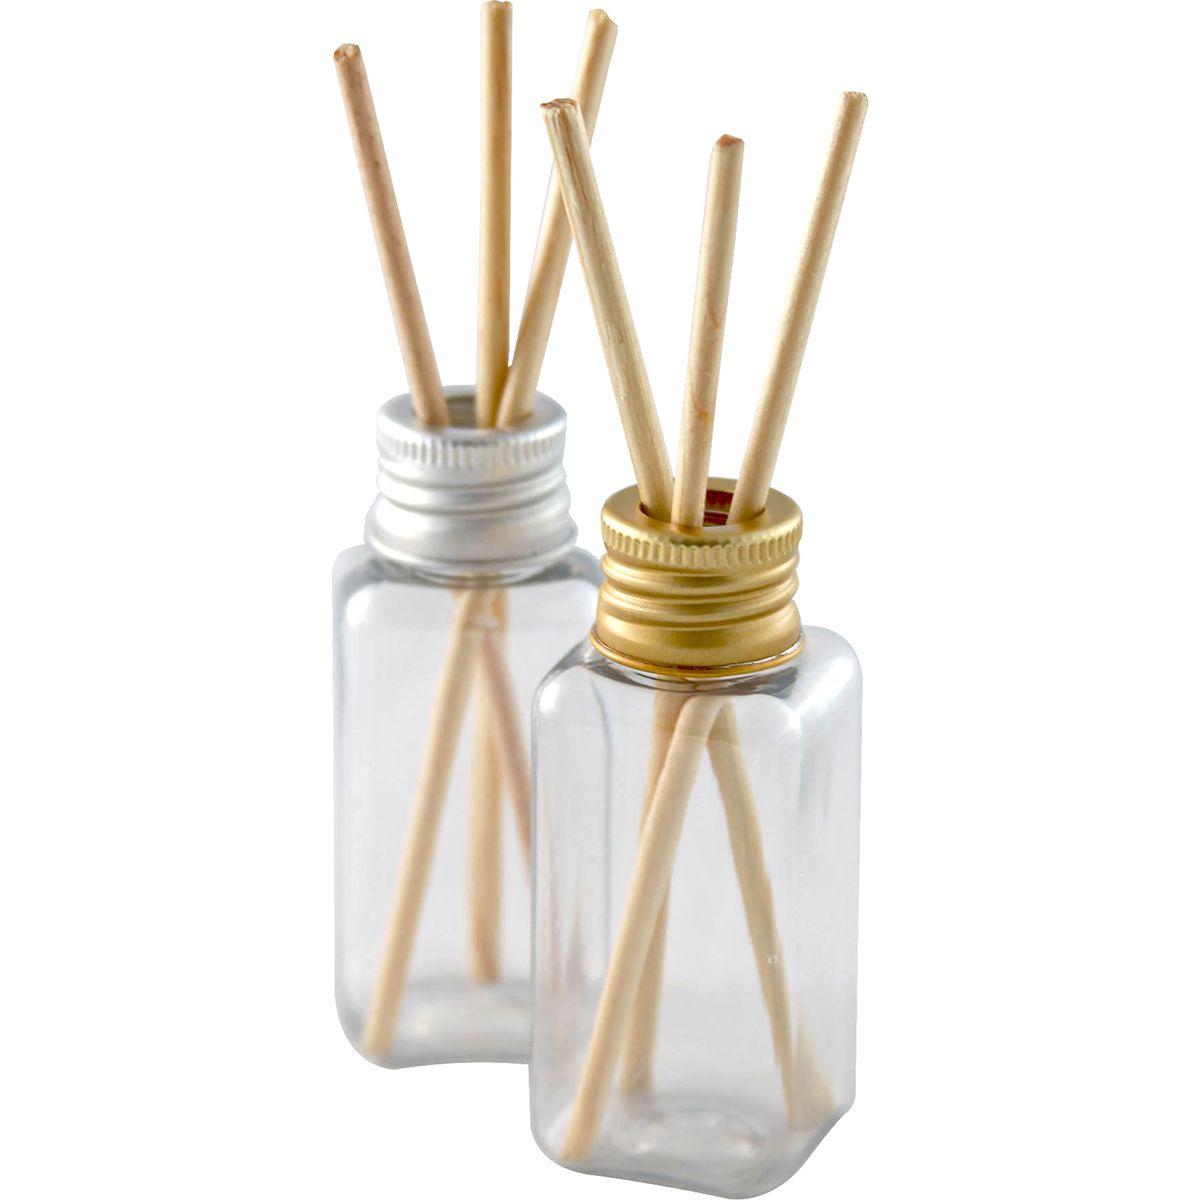 Frasco para Aromatizador Atacado Plástico de 40 ml kit com 30 unidades